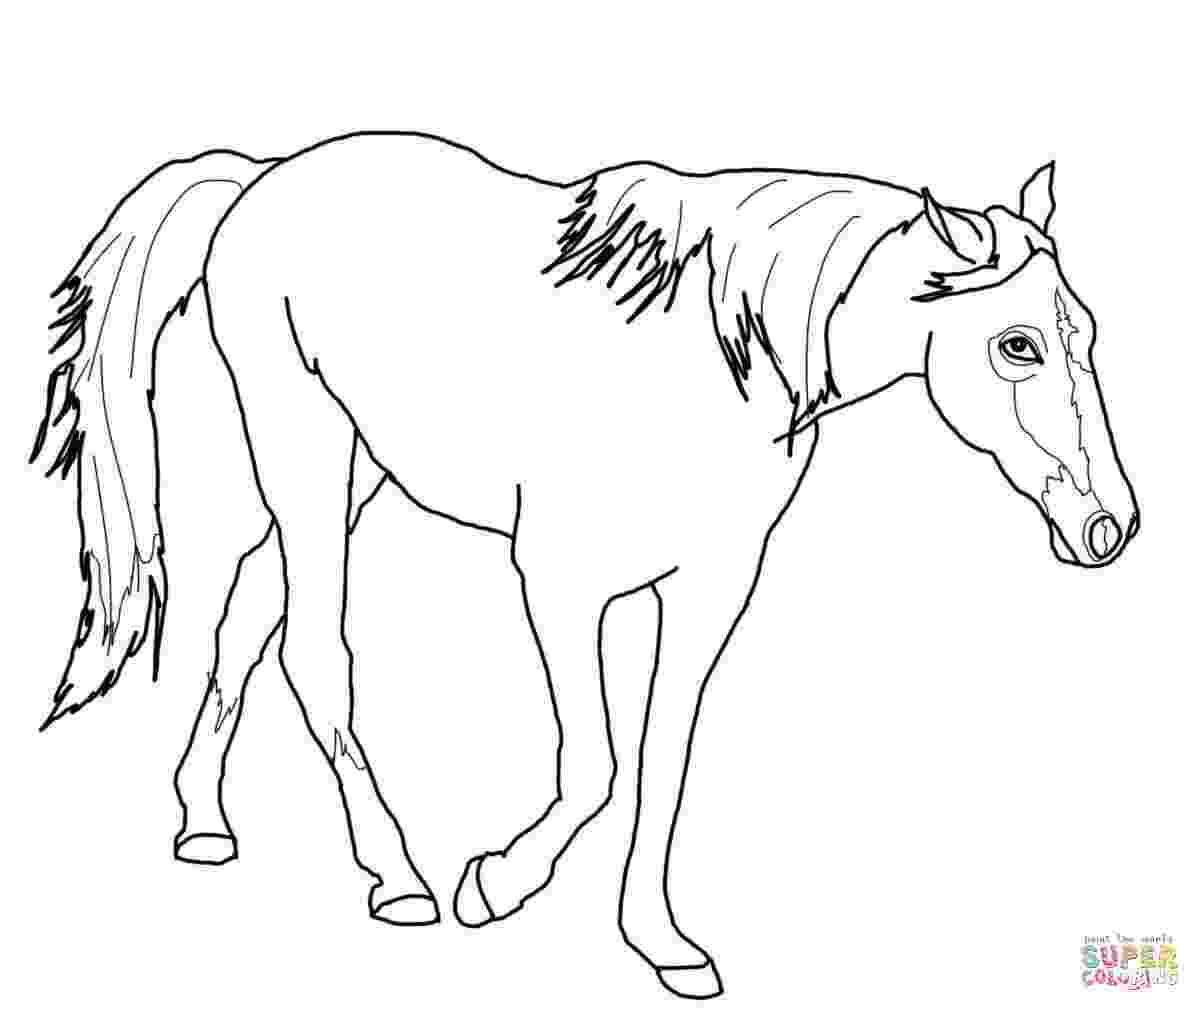 coloring pages horses horse coloring pages 09 horse coloring pages cute coloring pages horses